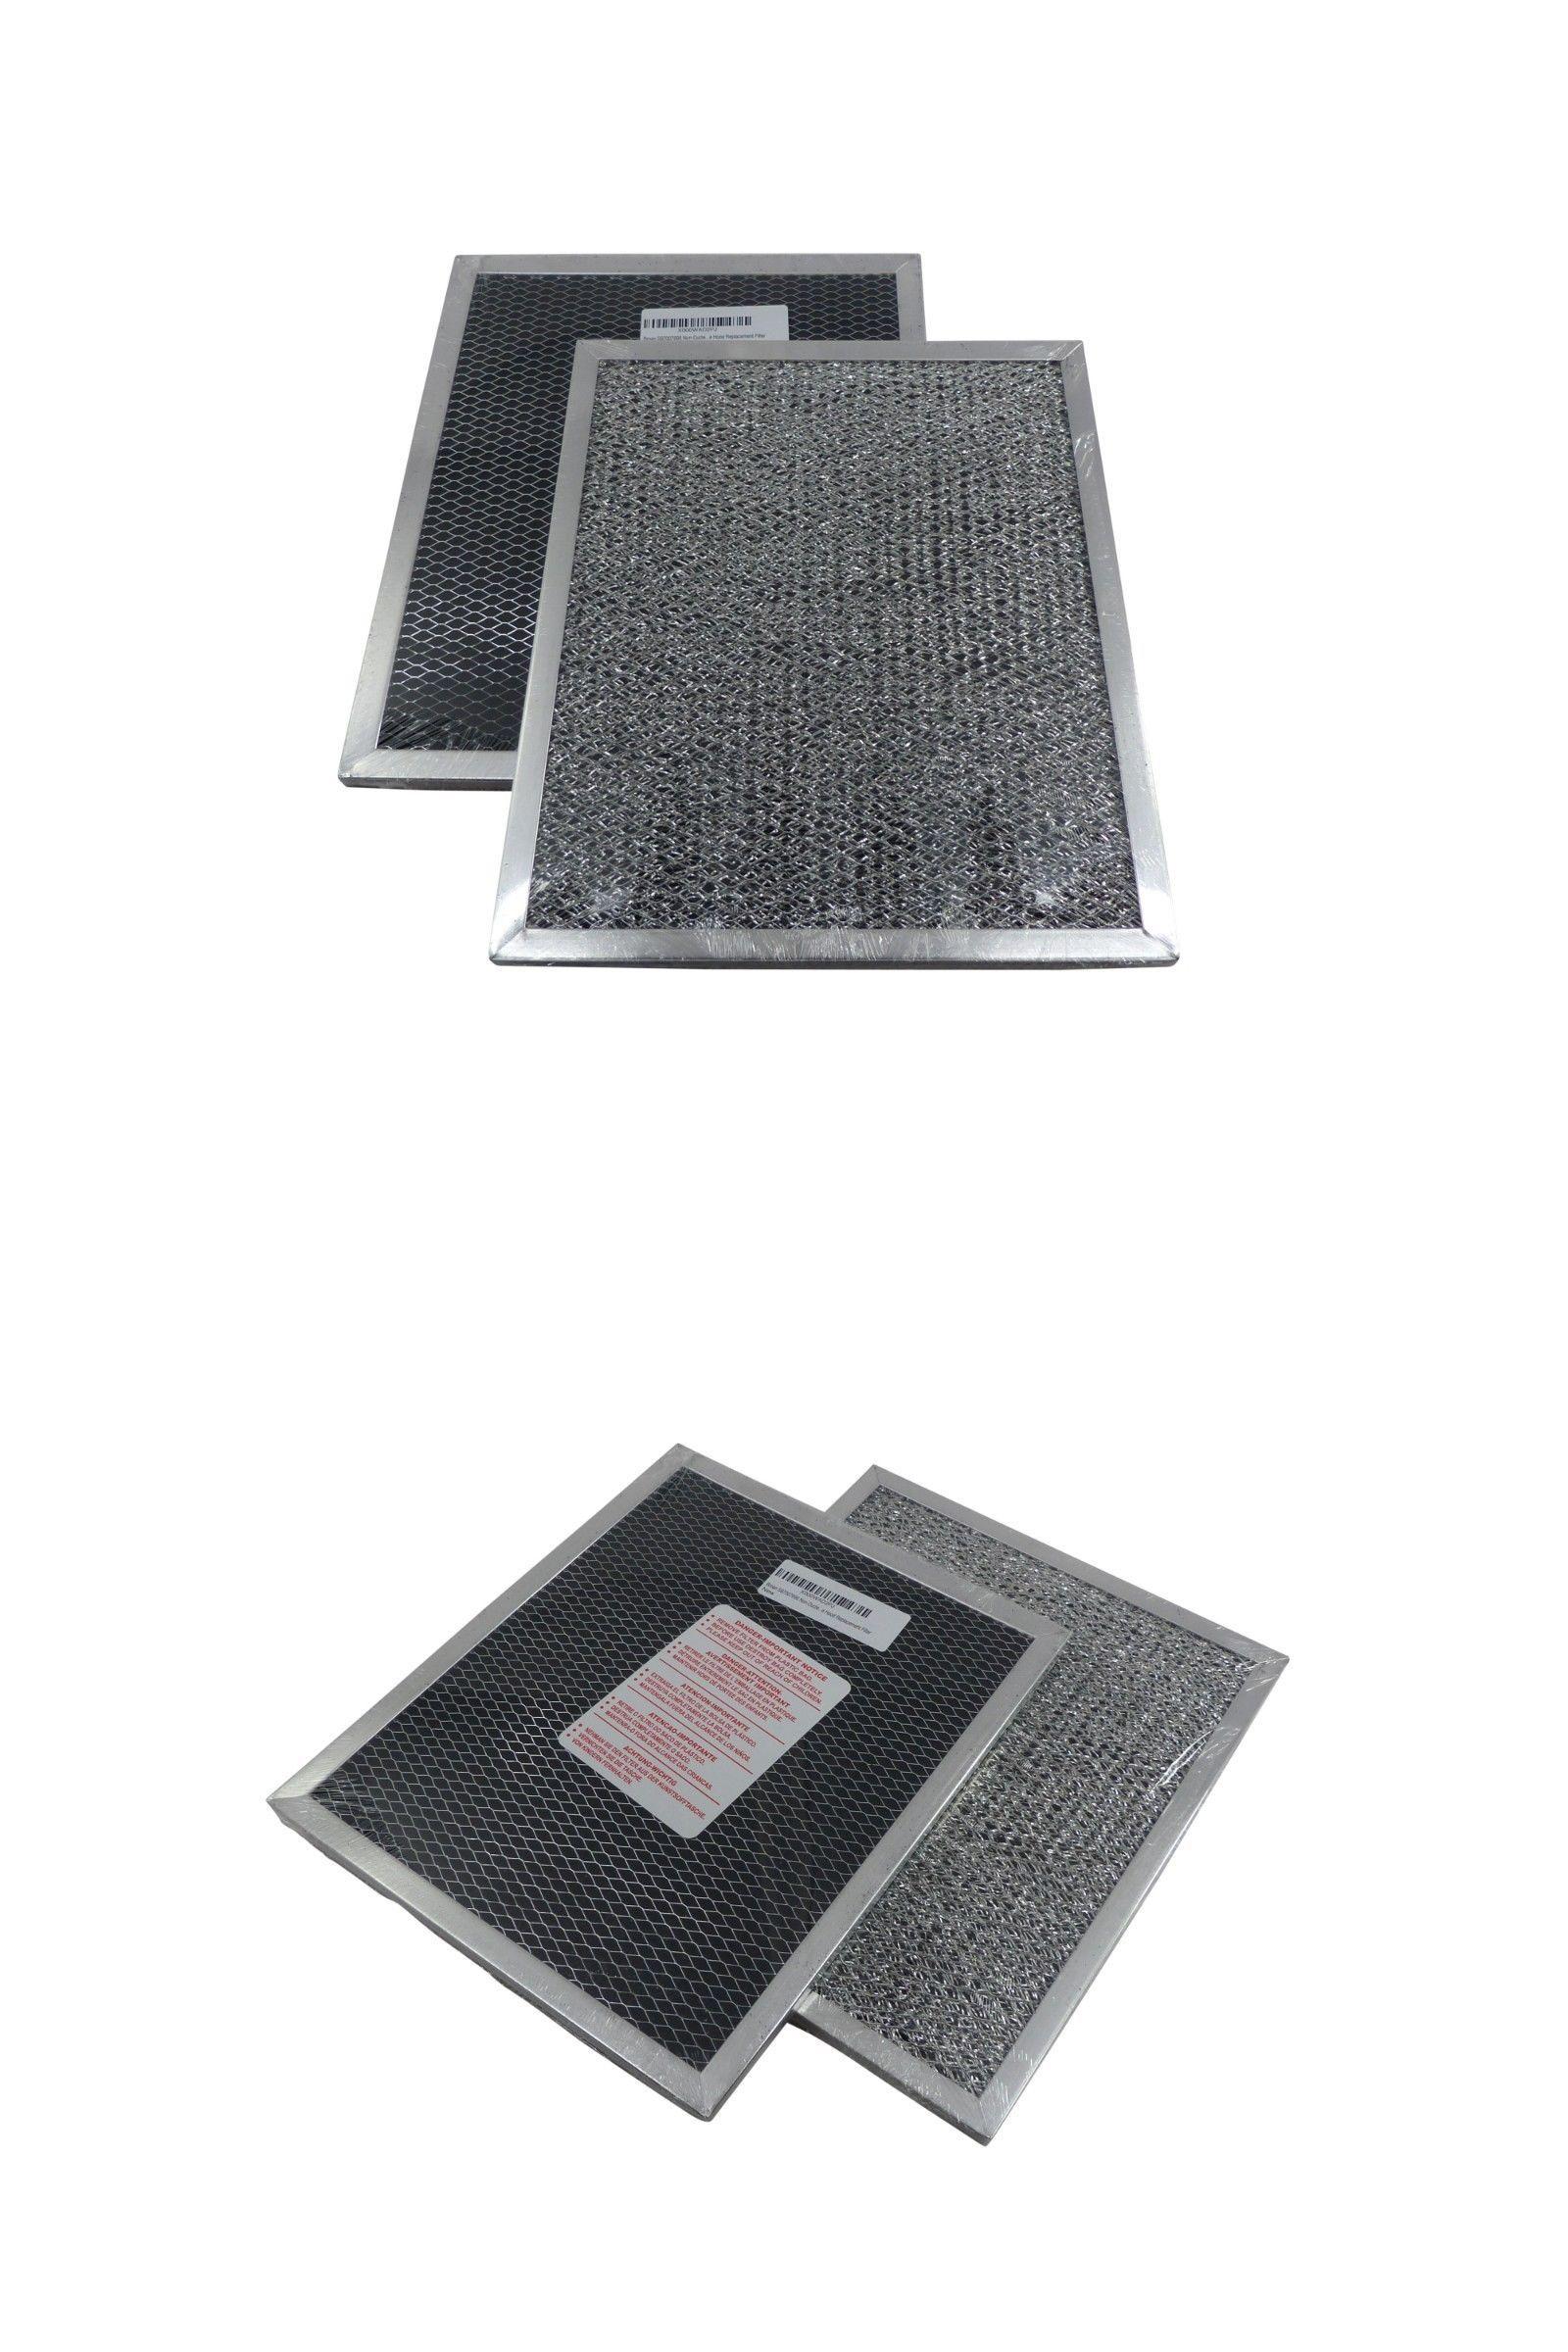 Broan Nutone 413004 30 Range Hood Single Charcoal Filter Voltage 120 V 60 Hz Ductless Range Hood Range Hood Ductless